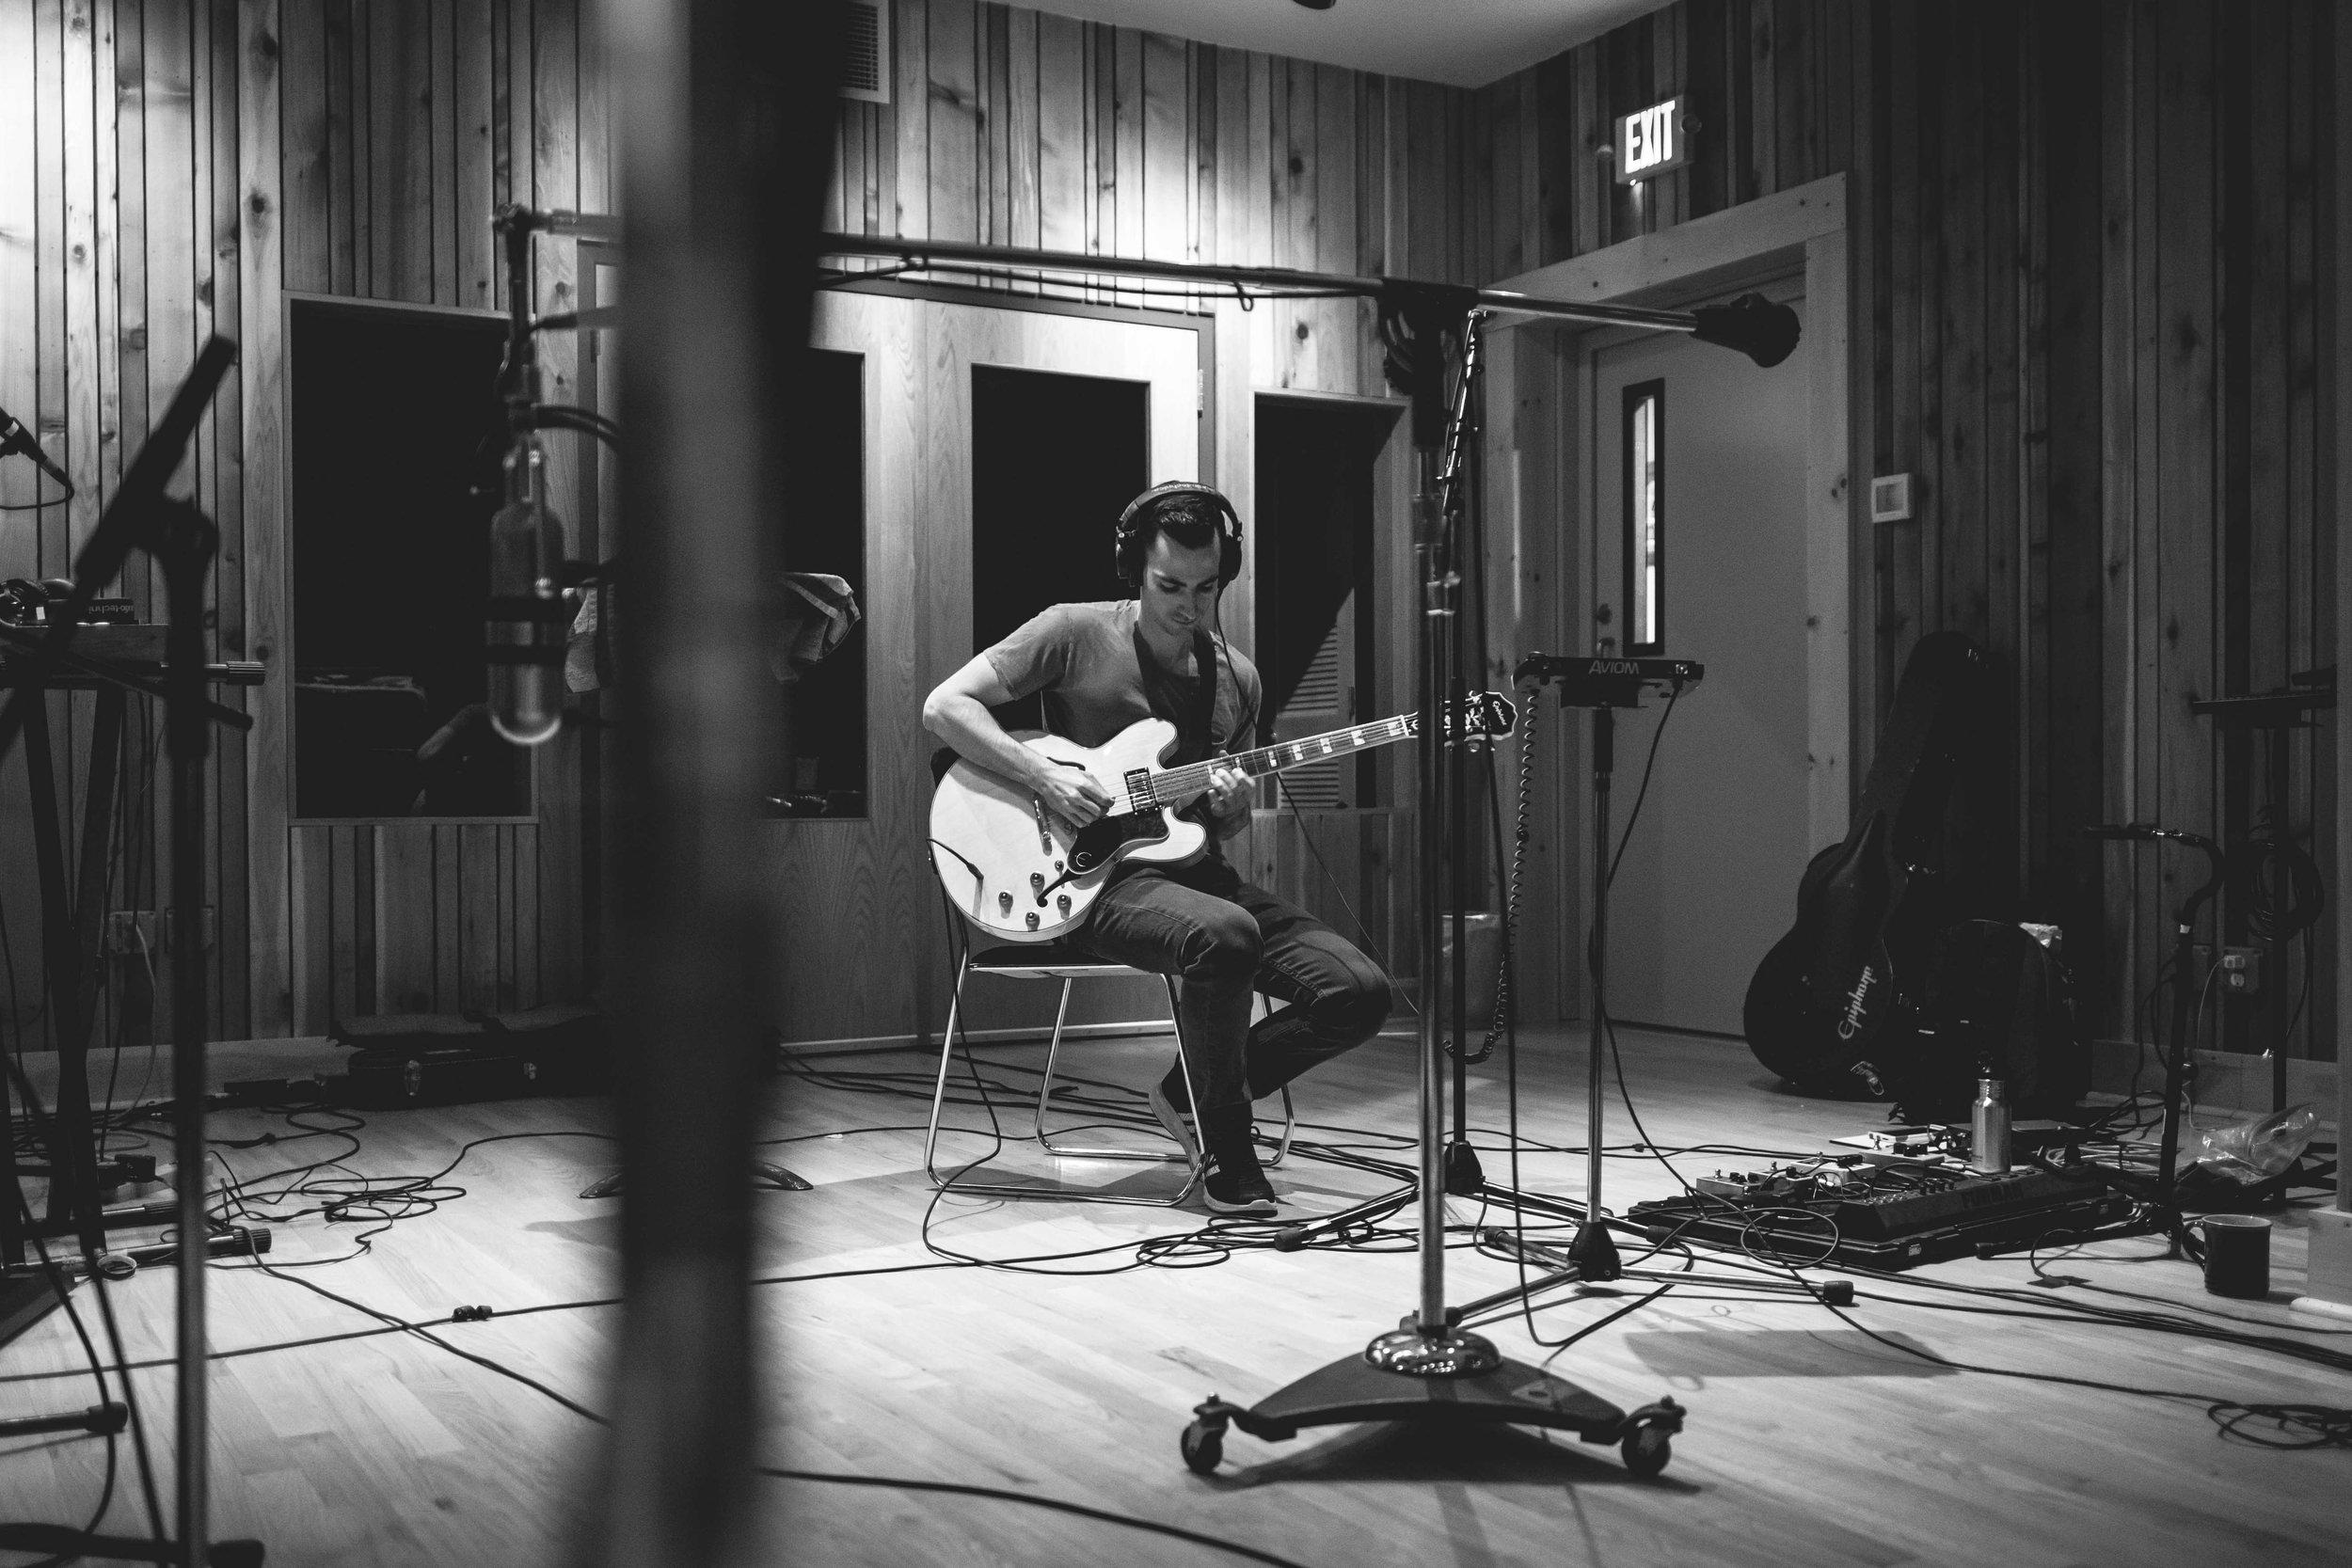 2018_07_06 Marble House Recording-9614.jpg